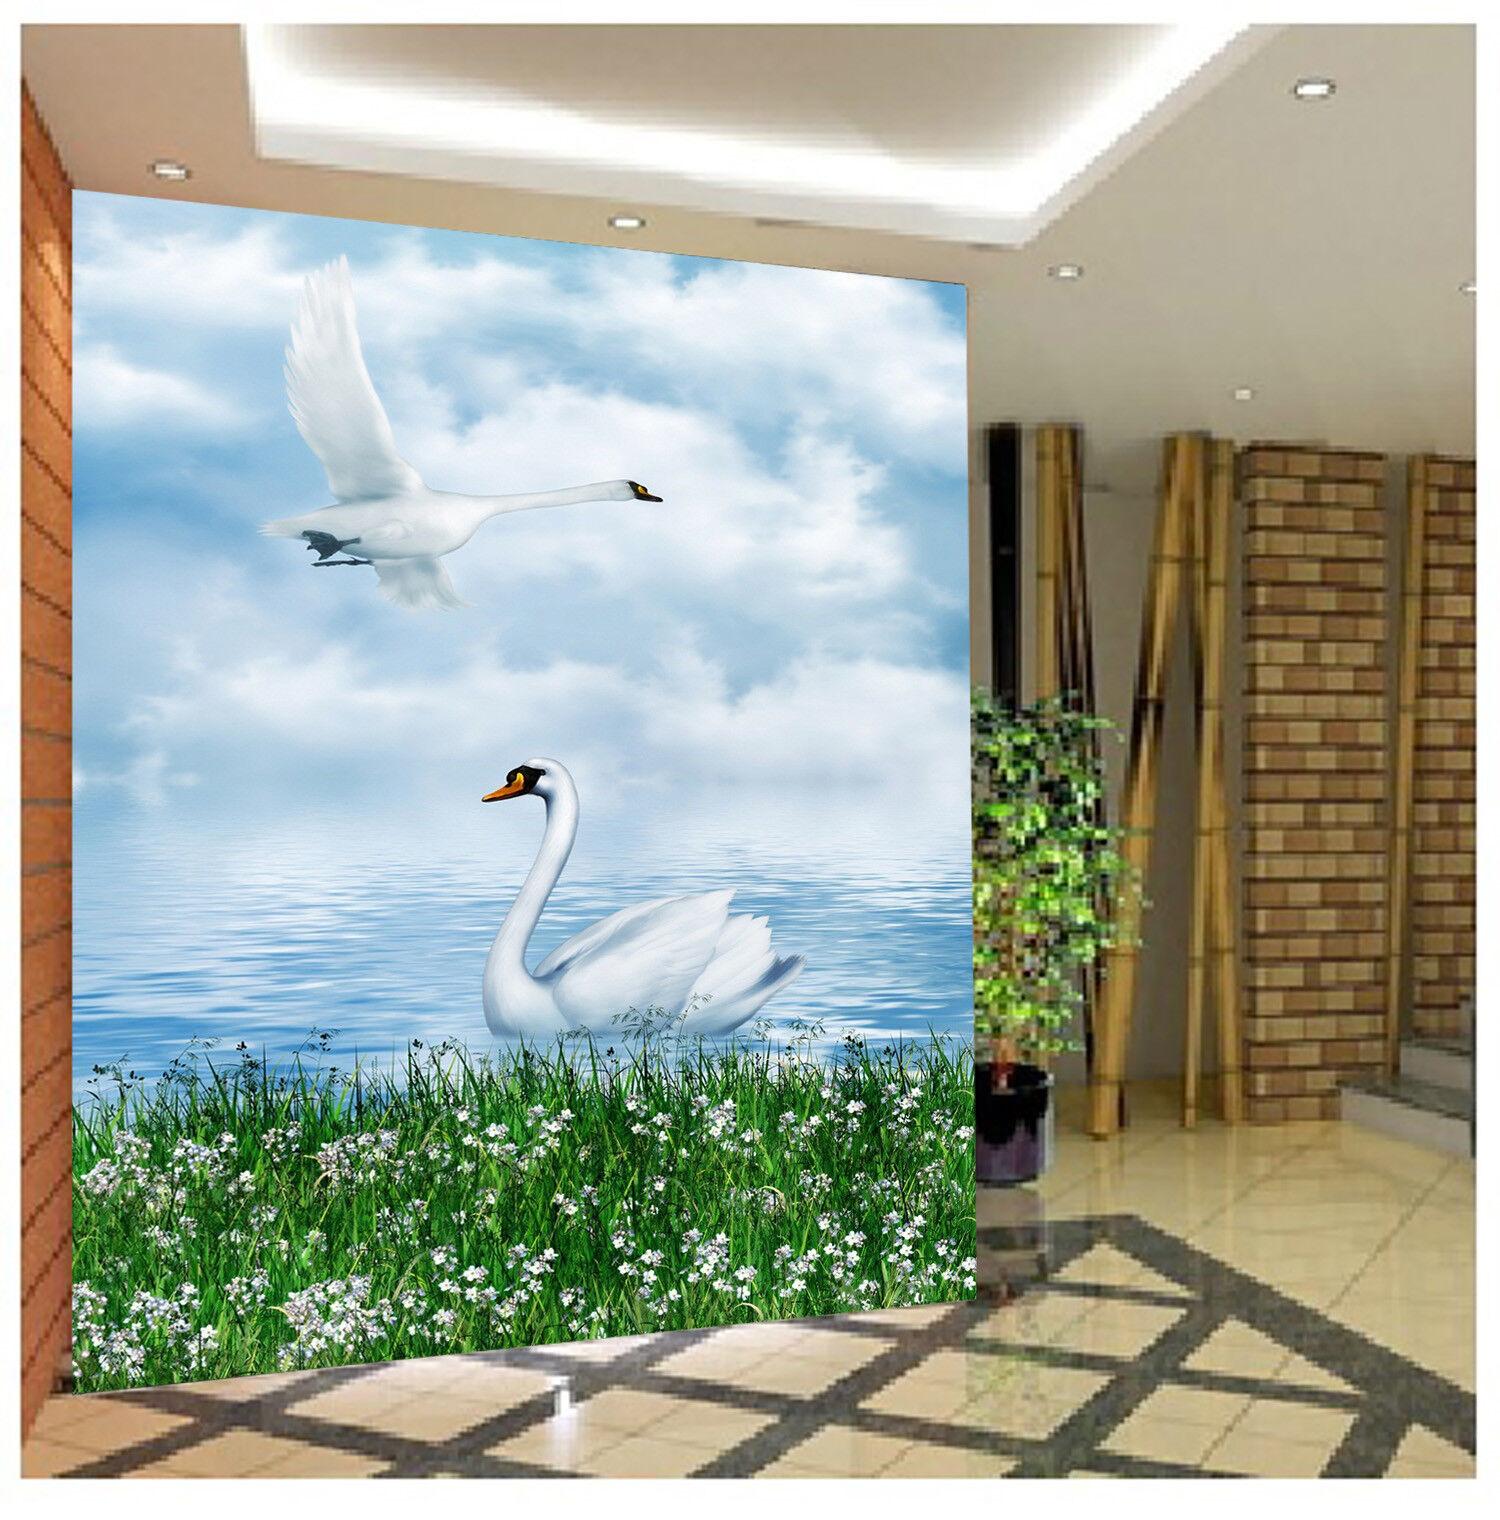 3D Sawn Grass Sky 53 Wallpaper Murals Wall Print Wallpaper Mural AJ WALL AU Kyra